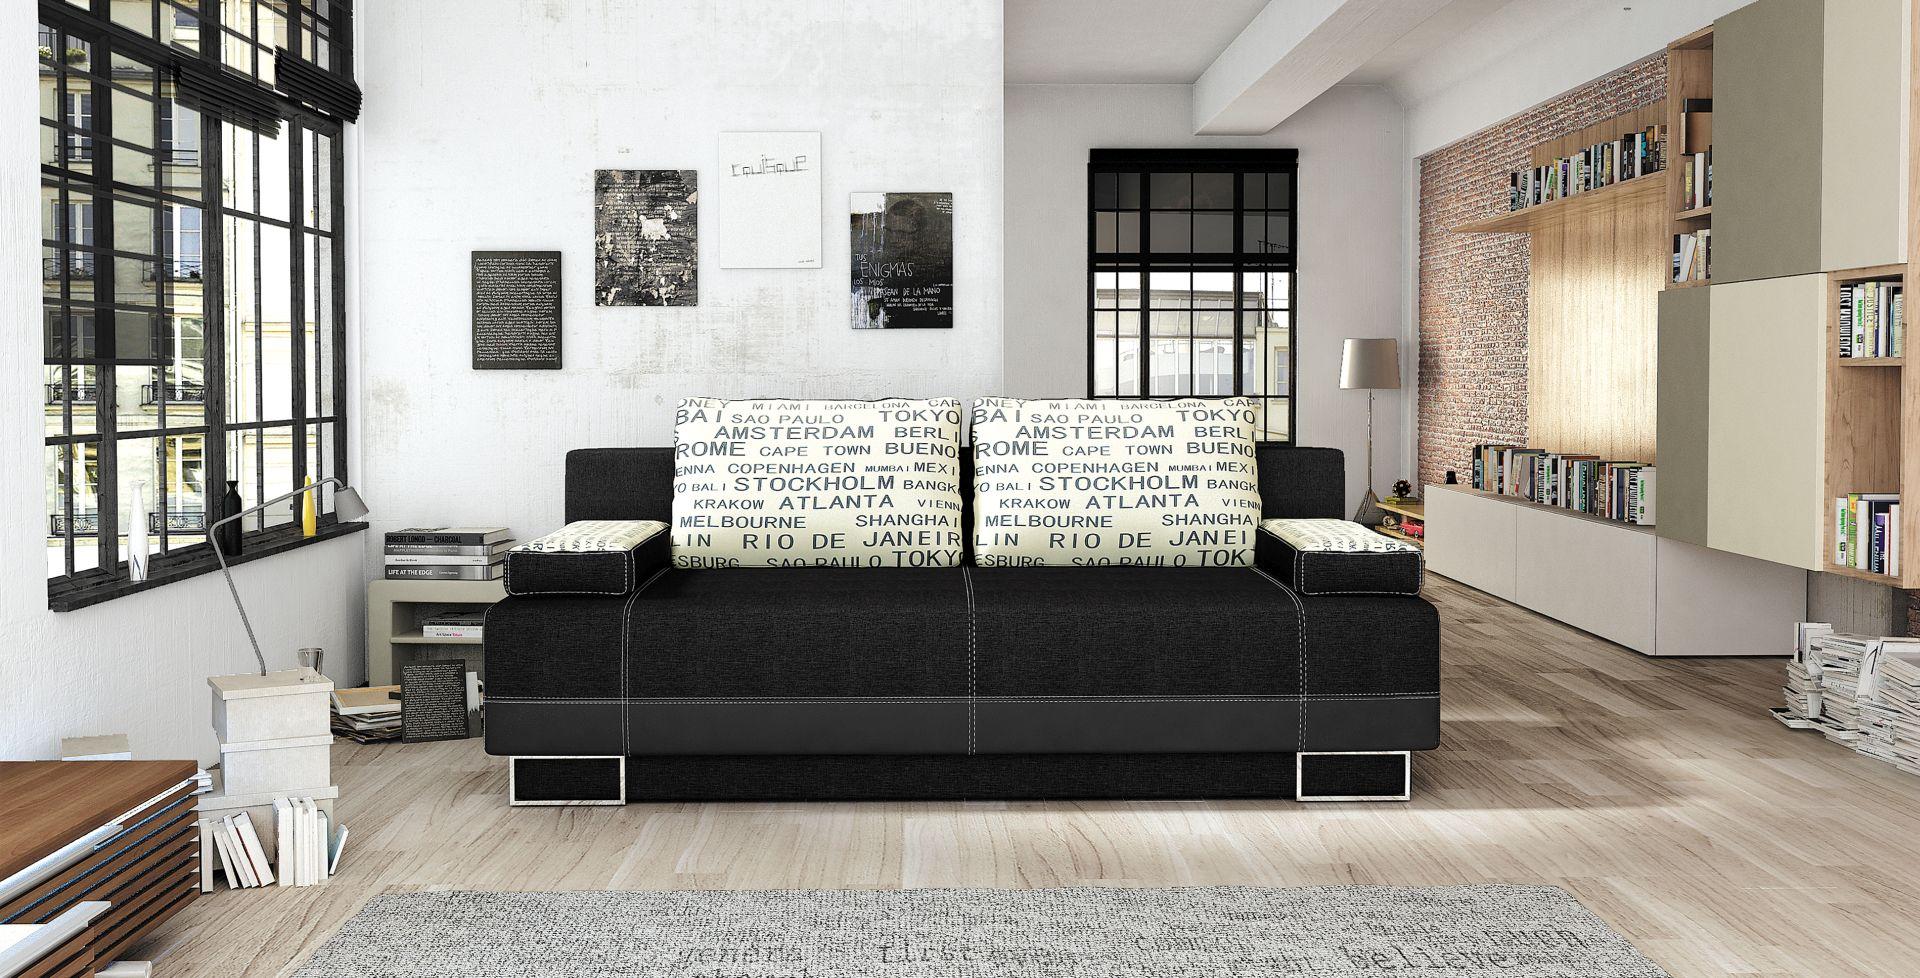 Full Size of Couch Ausklappbar Sofa Veras Schlafcouch Polstersofa Schlafsofa Polstercouch Ausklappbares Bett Wohnzimmer Couch Ausklappbar